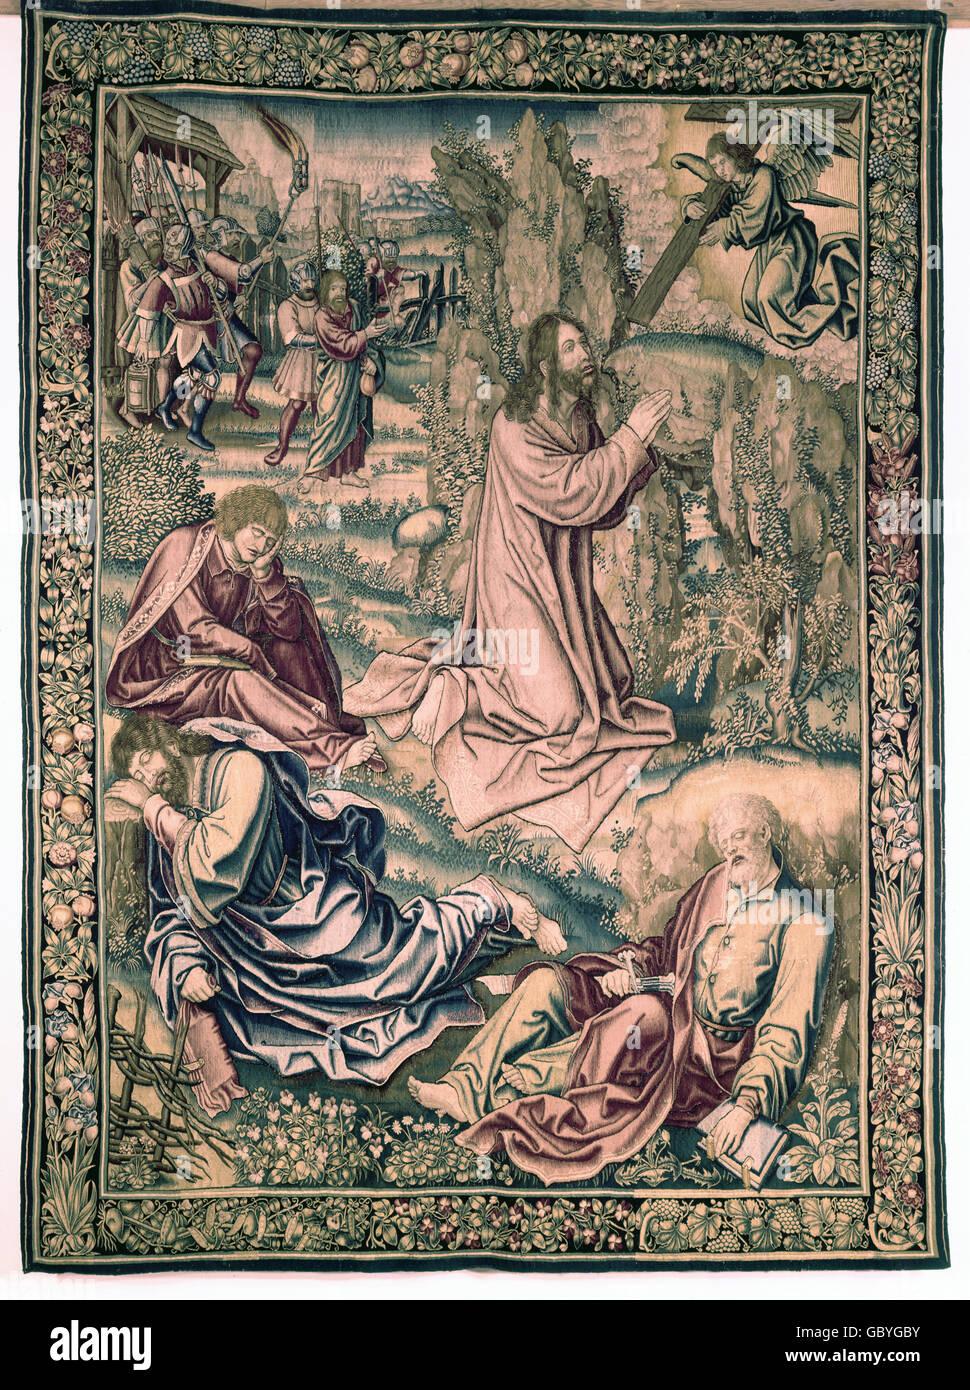 "Bildende Kunst, Teppich, Textilien, Tapisserie ""Christus am Ölberg"", Brüssel, 16. Jahrhundert, Stockbild"